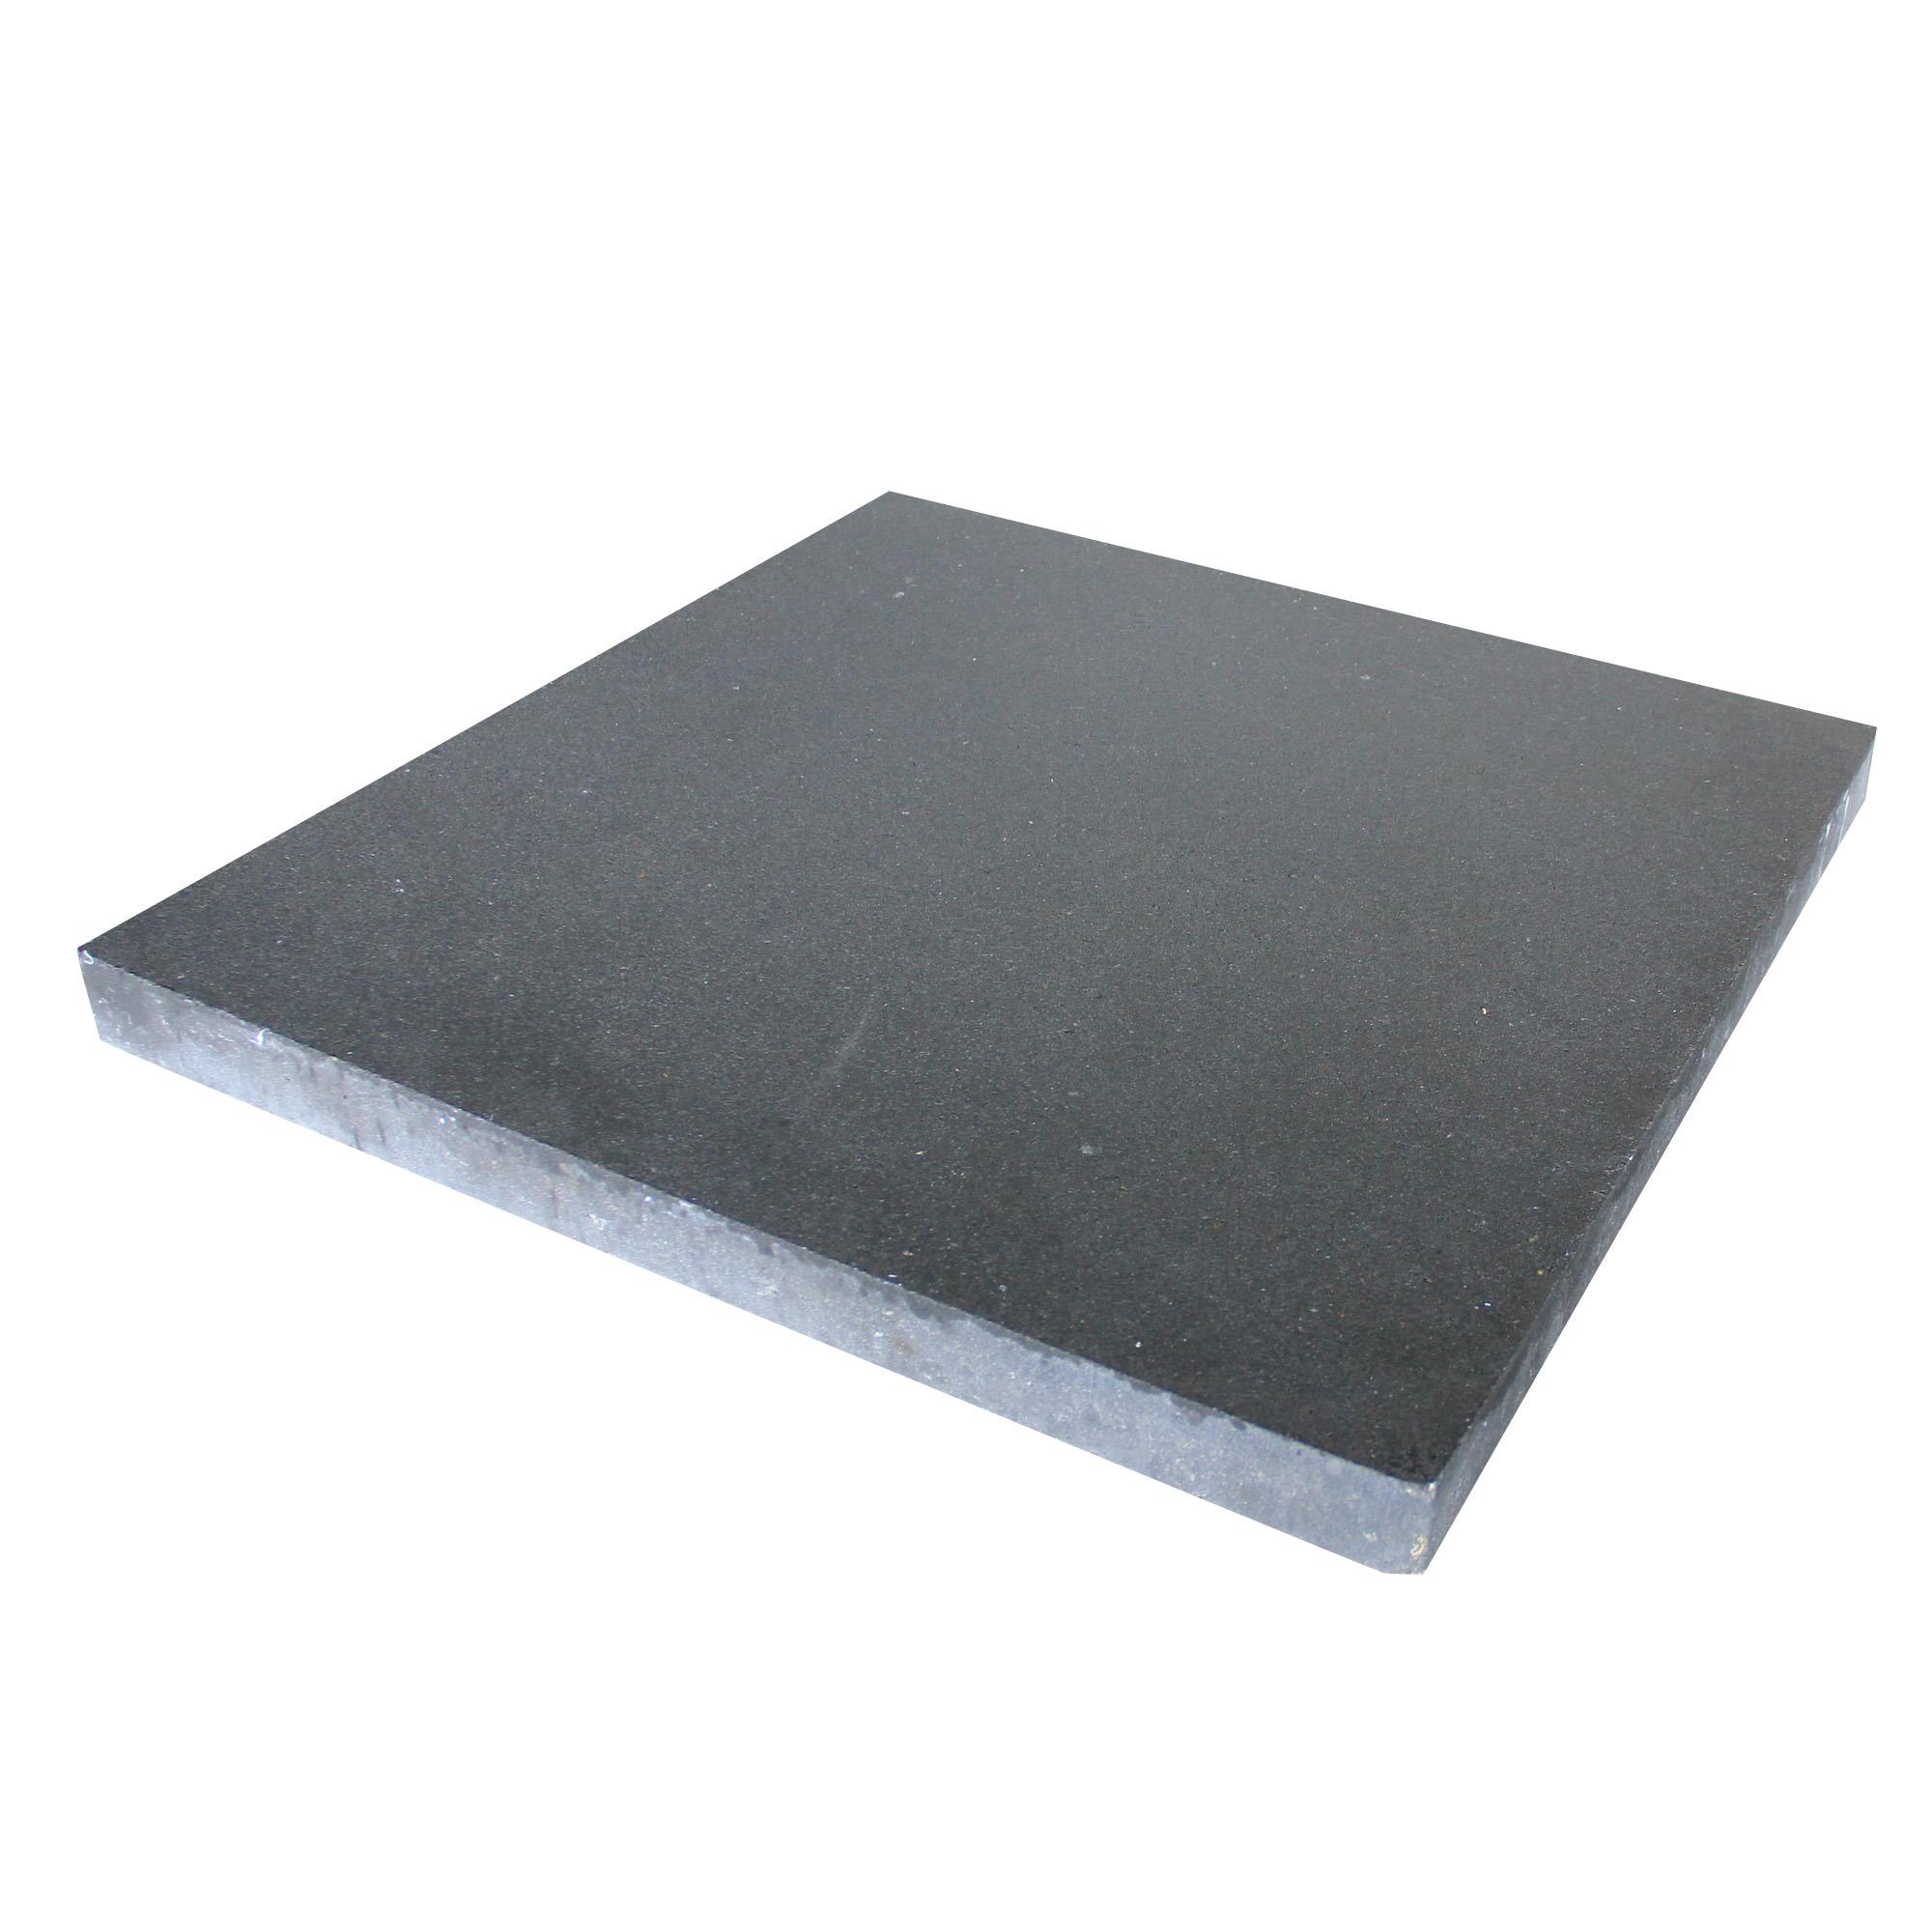 Terrastegel Beton Broadway Antraciet 60x60 cm - Per Tegel - 0,36 m2